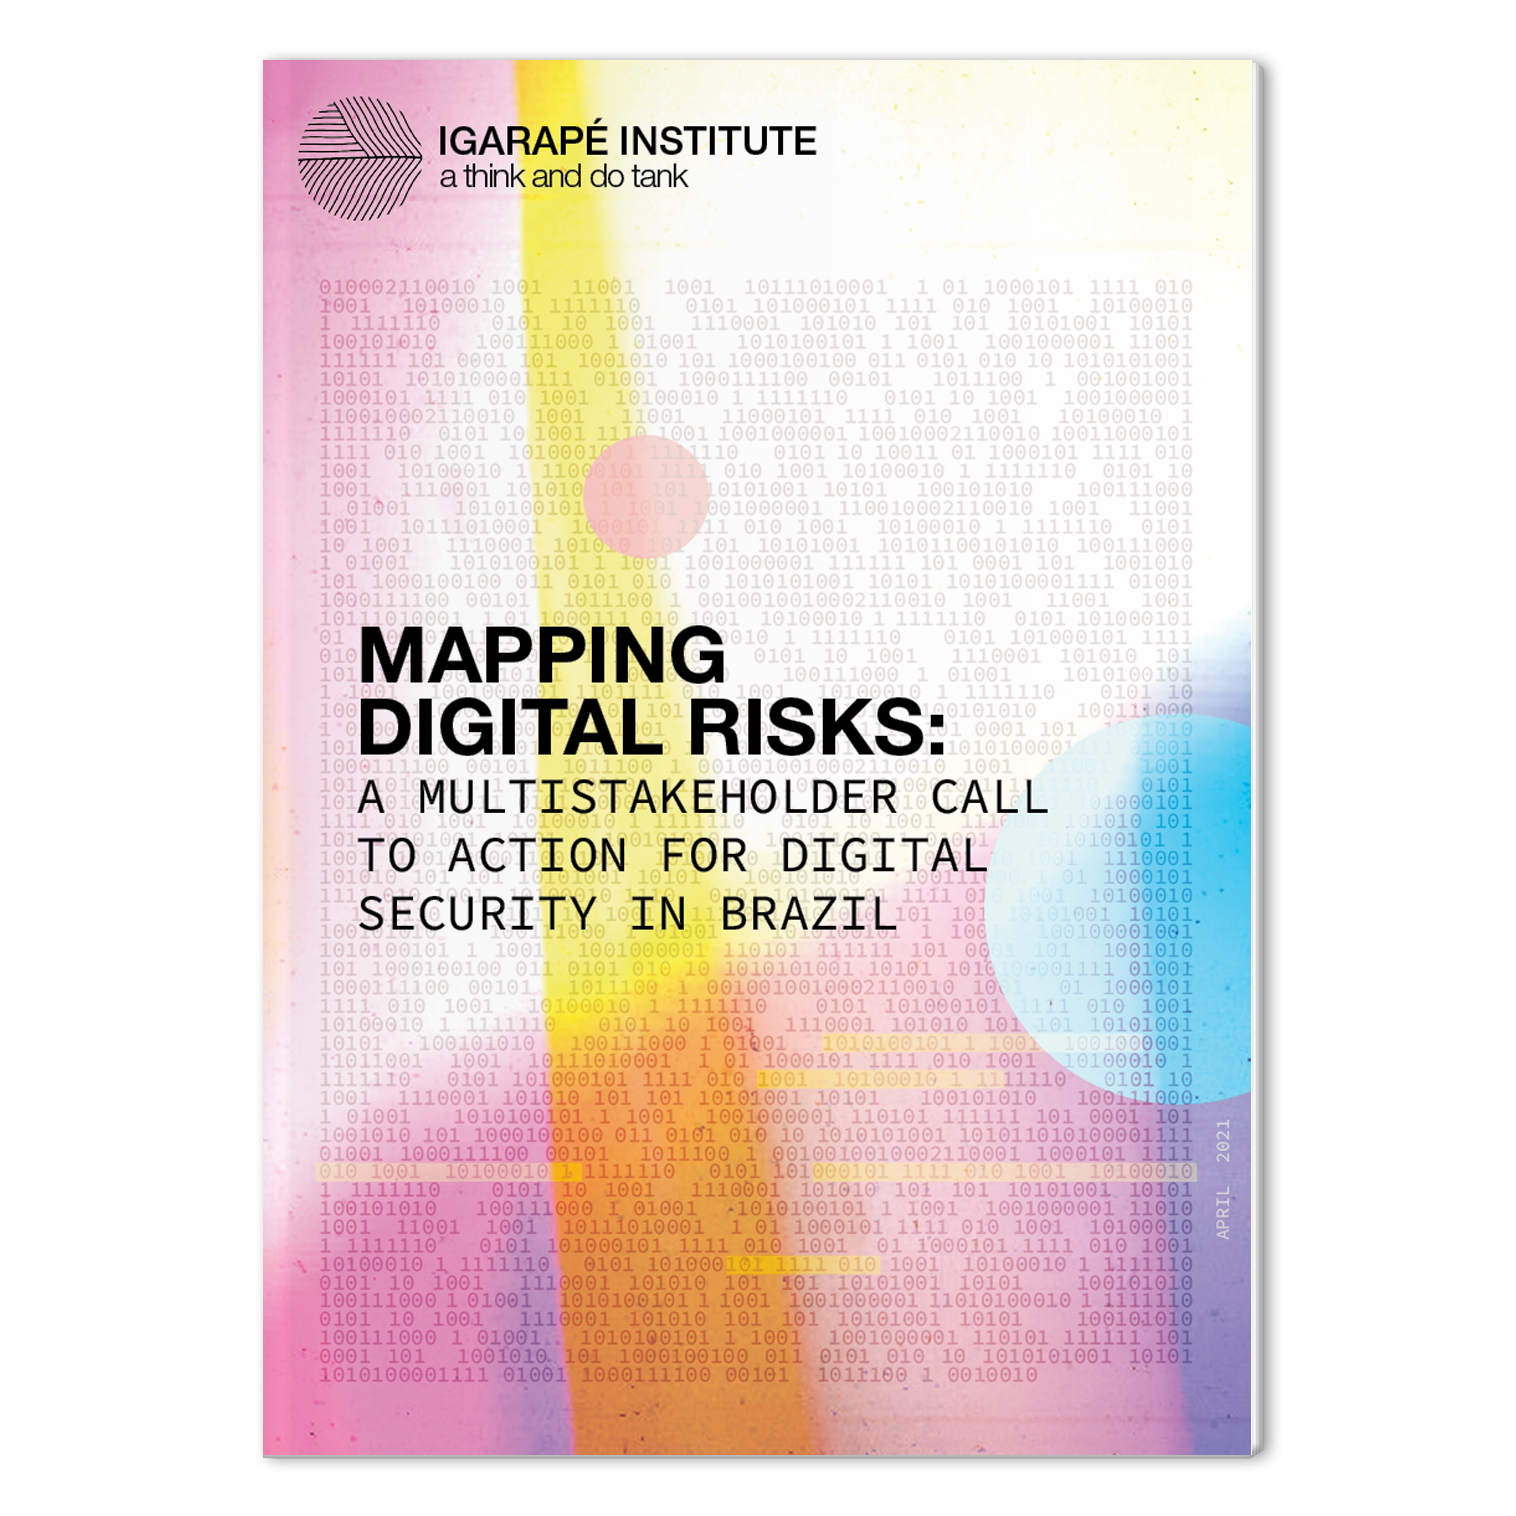 Mapping Digital Risks Brazil